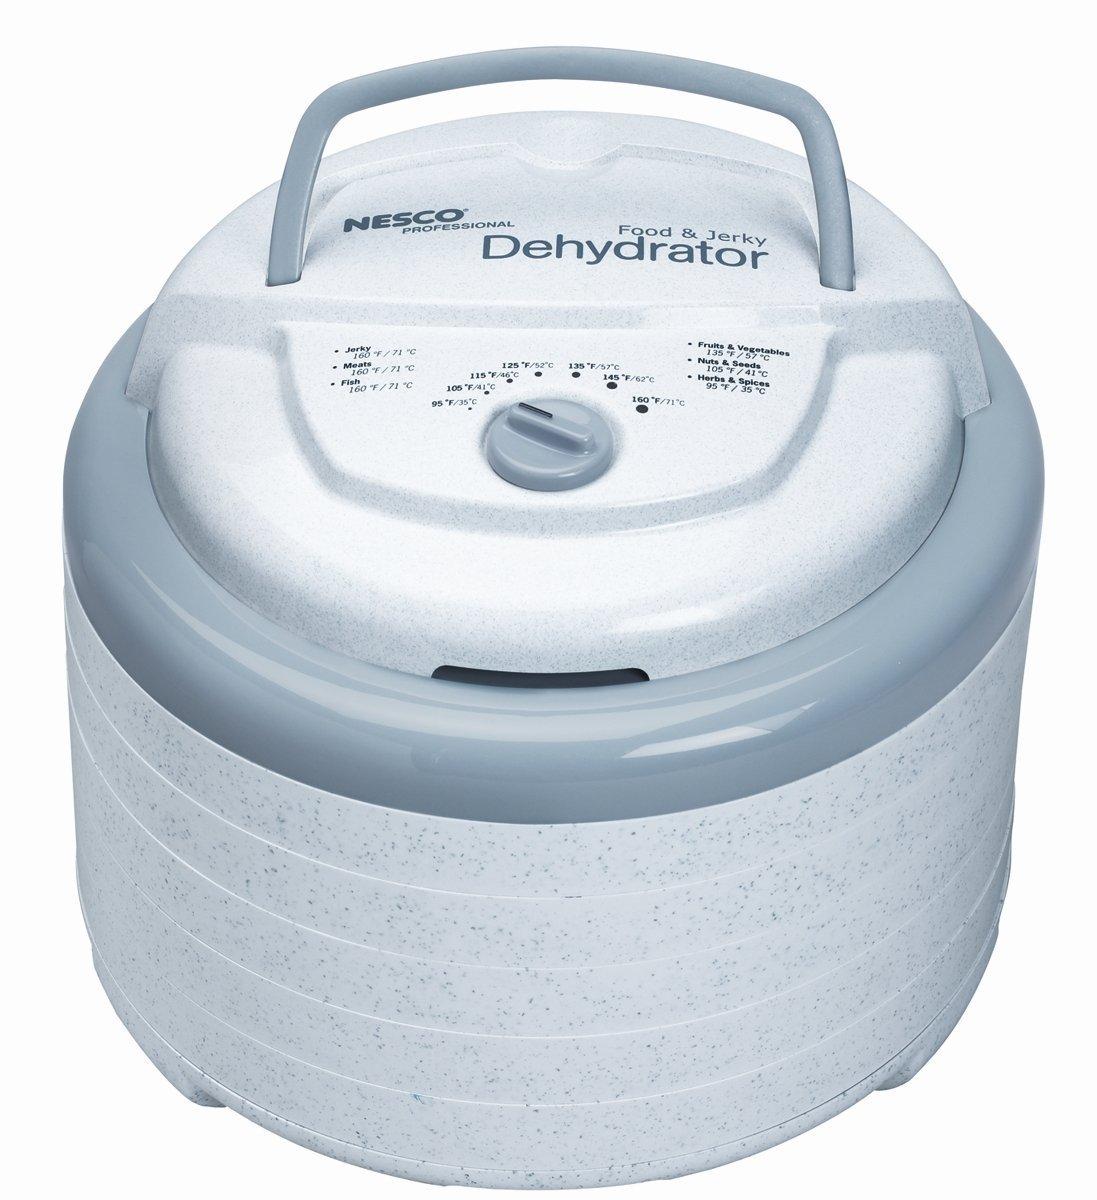 Nesco Snackmaster Pro Food Dehydrator, 600-Watt, FD-75PR